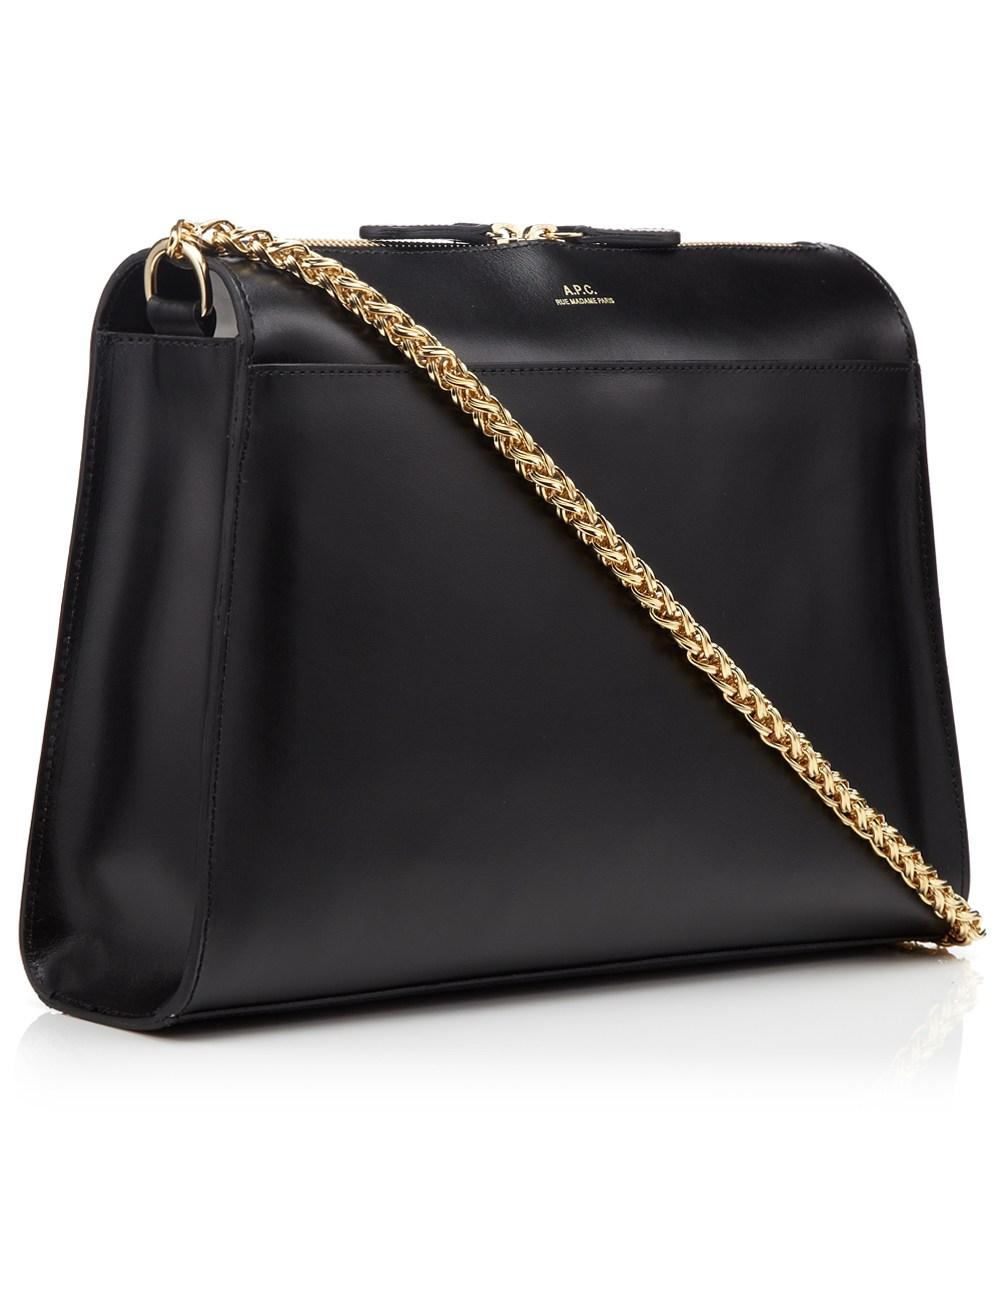 A.p.c. Black Leather Edith Shoulder Bag in Black | Lyst